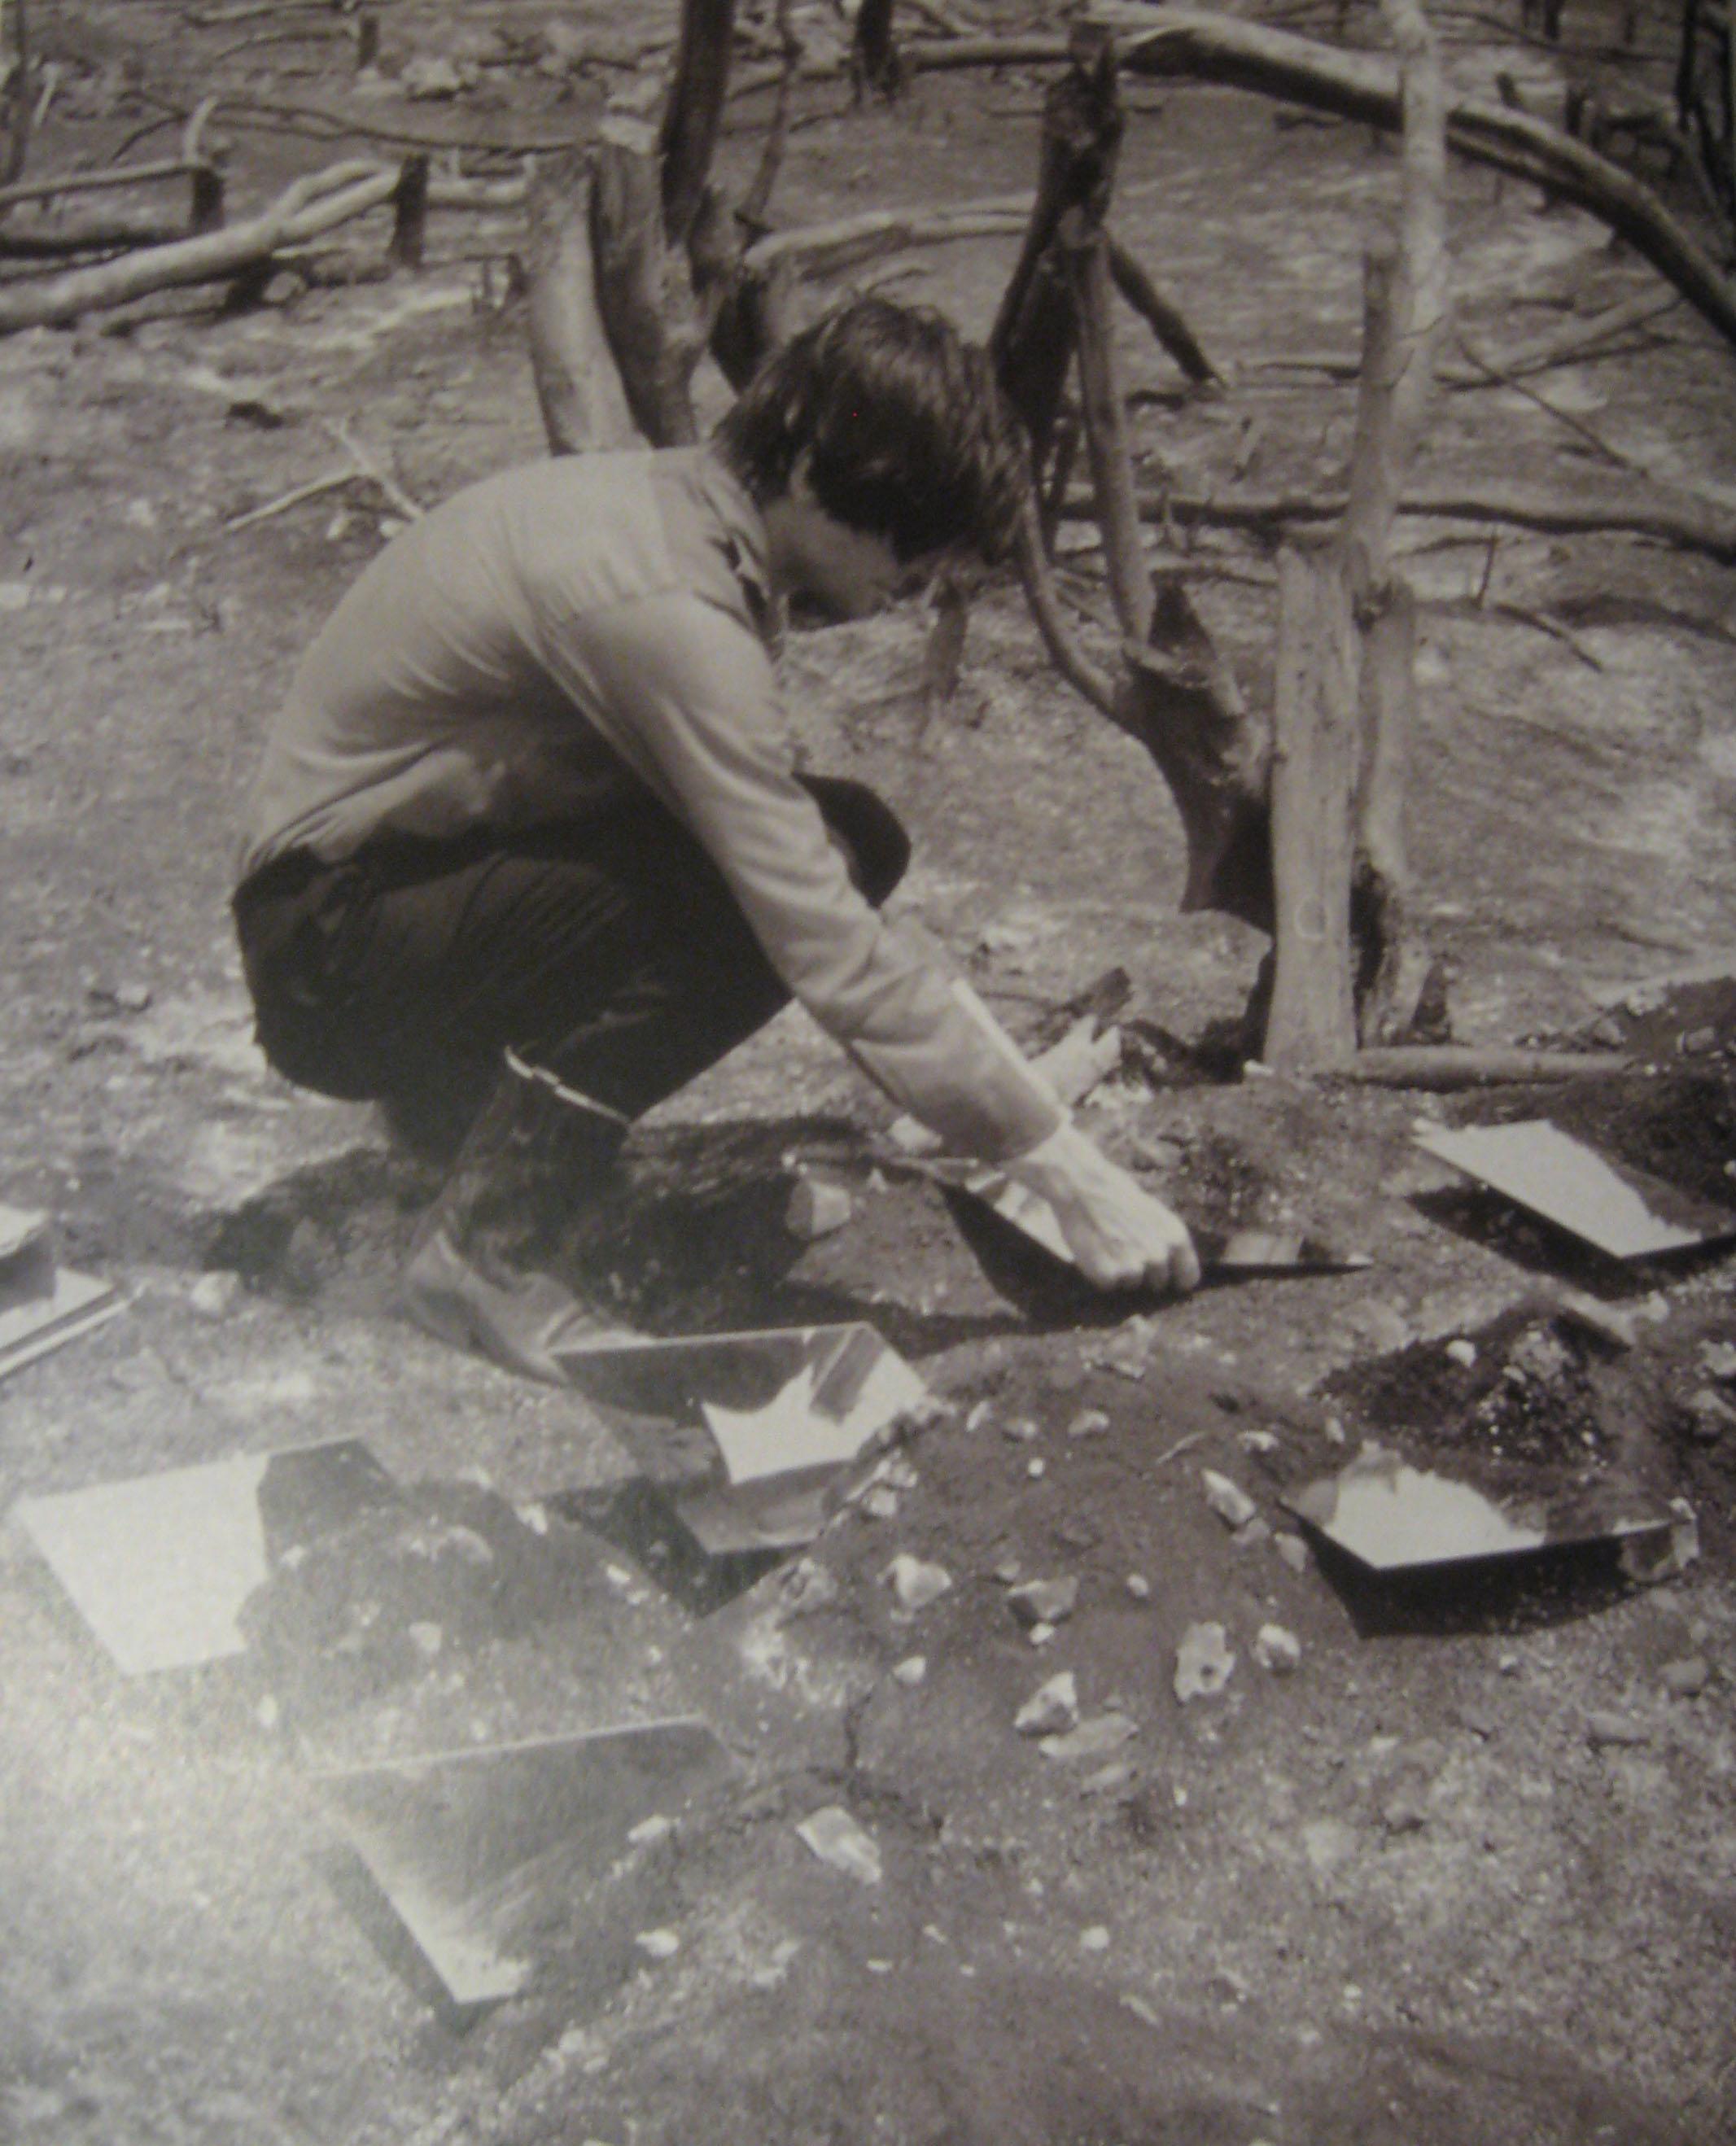 Smithson-Yucatan_Mirror_Displacements-1969_2.jpg